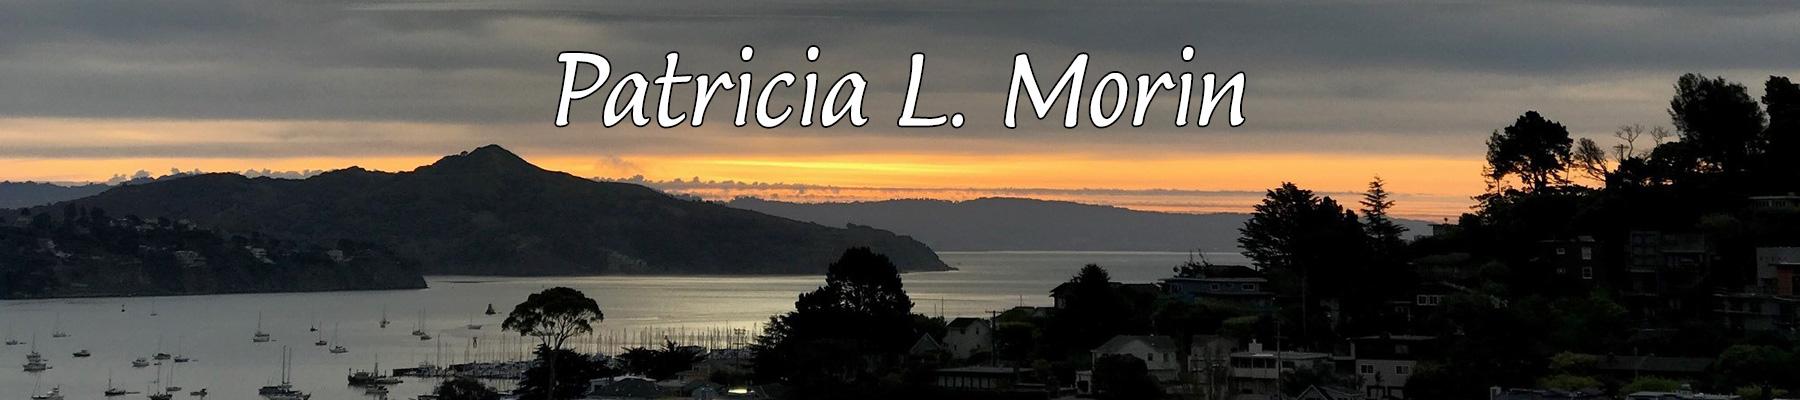 Patricia L. Morin